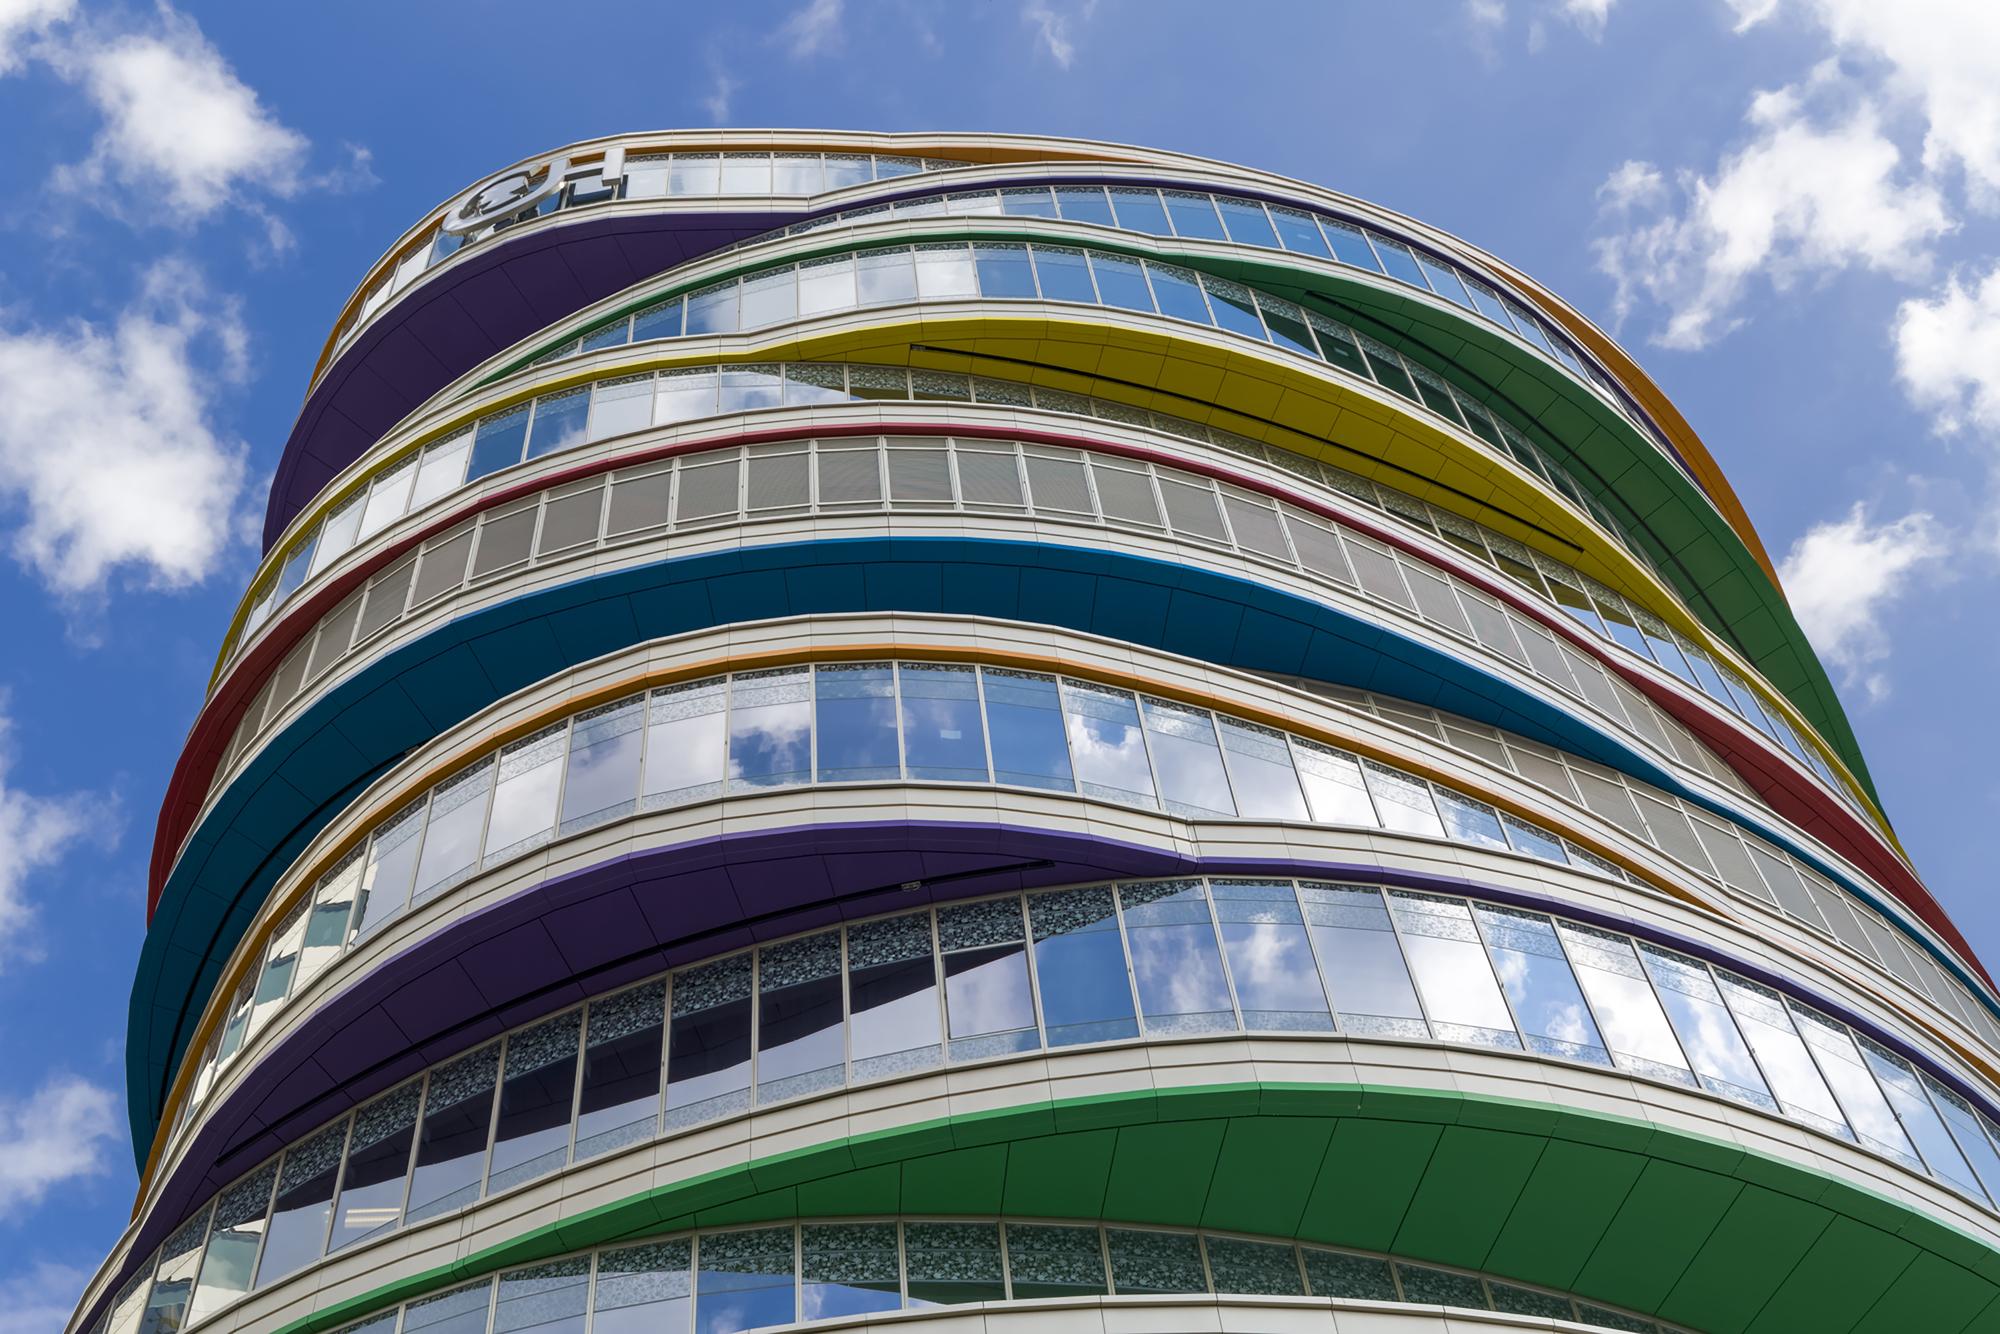 Gallery of Buerger Center for Advanced Pediatric Care / Pelli Clarke Pelli Architects - 9